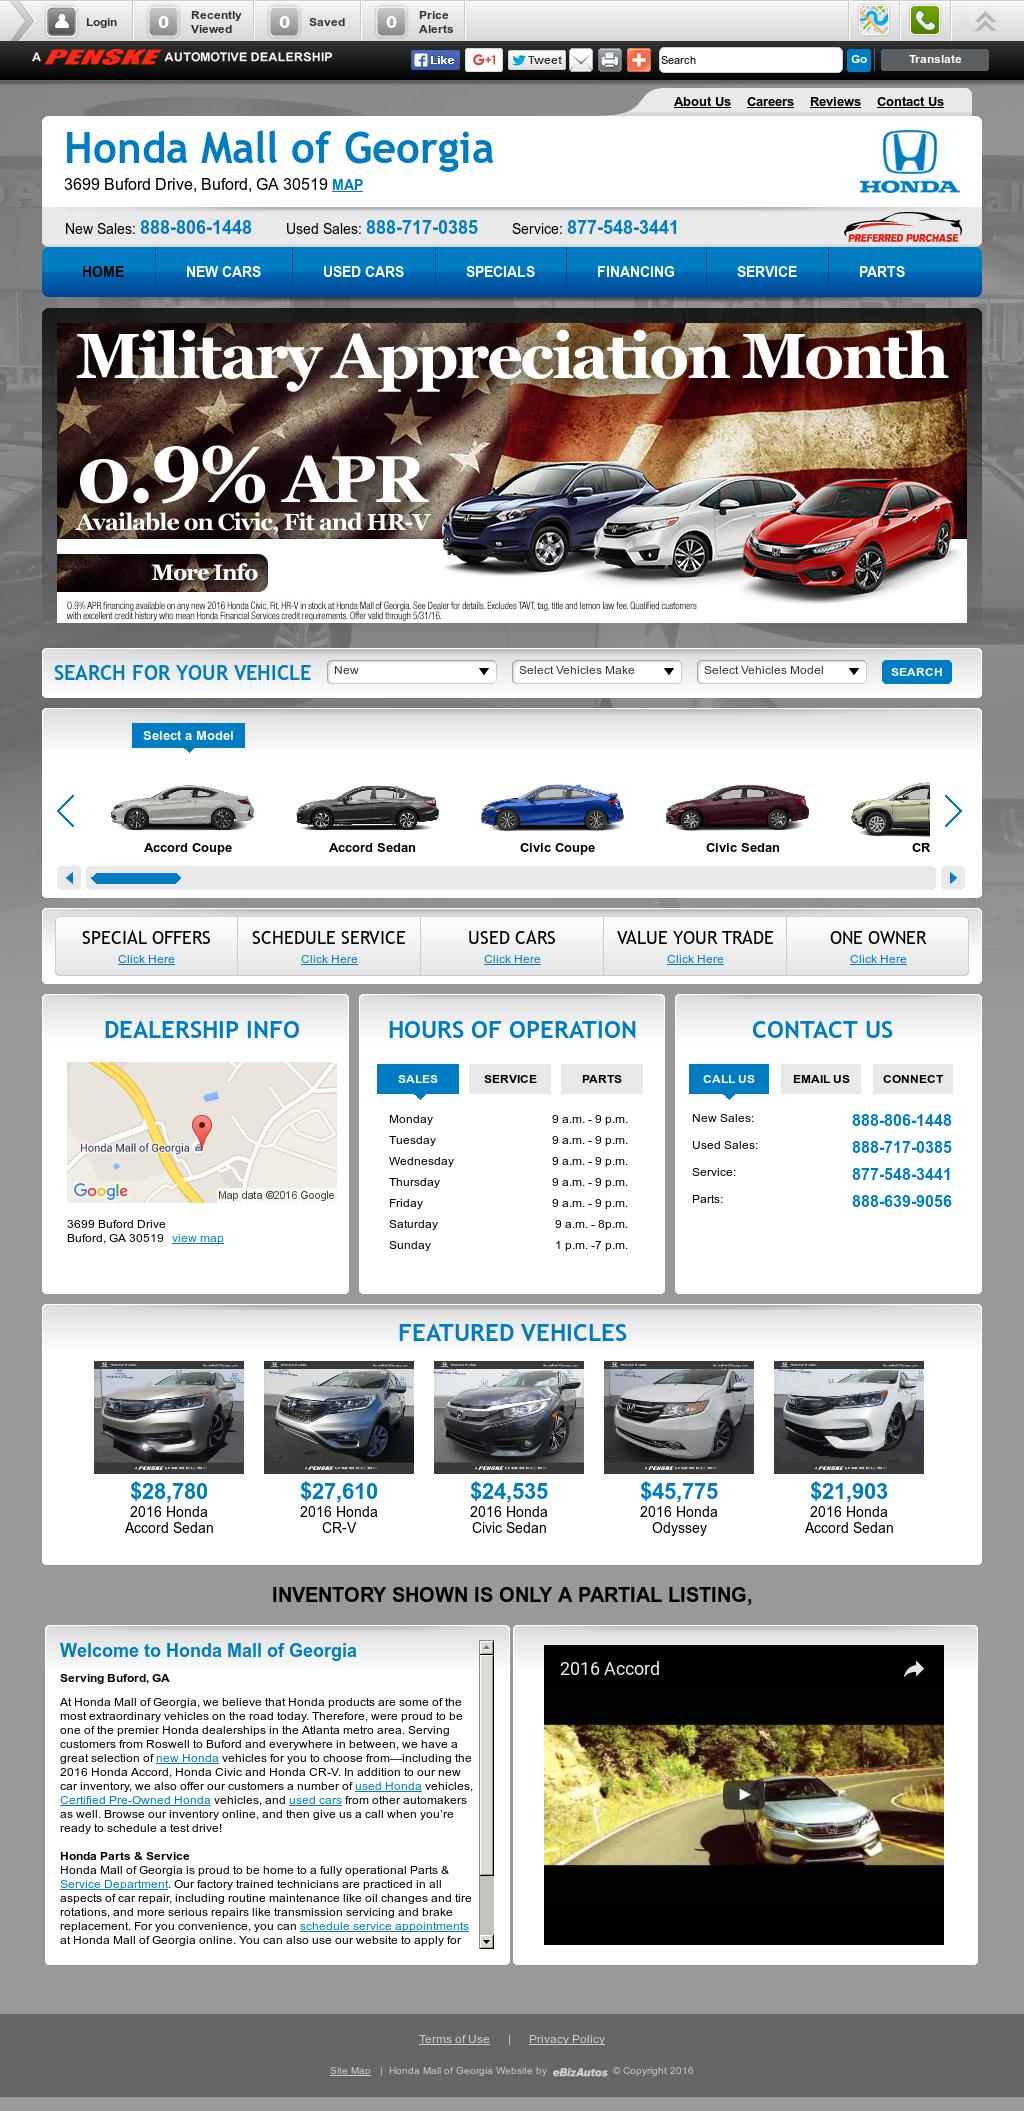 Honda Mall Of Georgia Competitors, Revenue And Employees   Owler Company  Profile